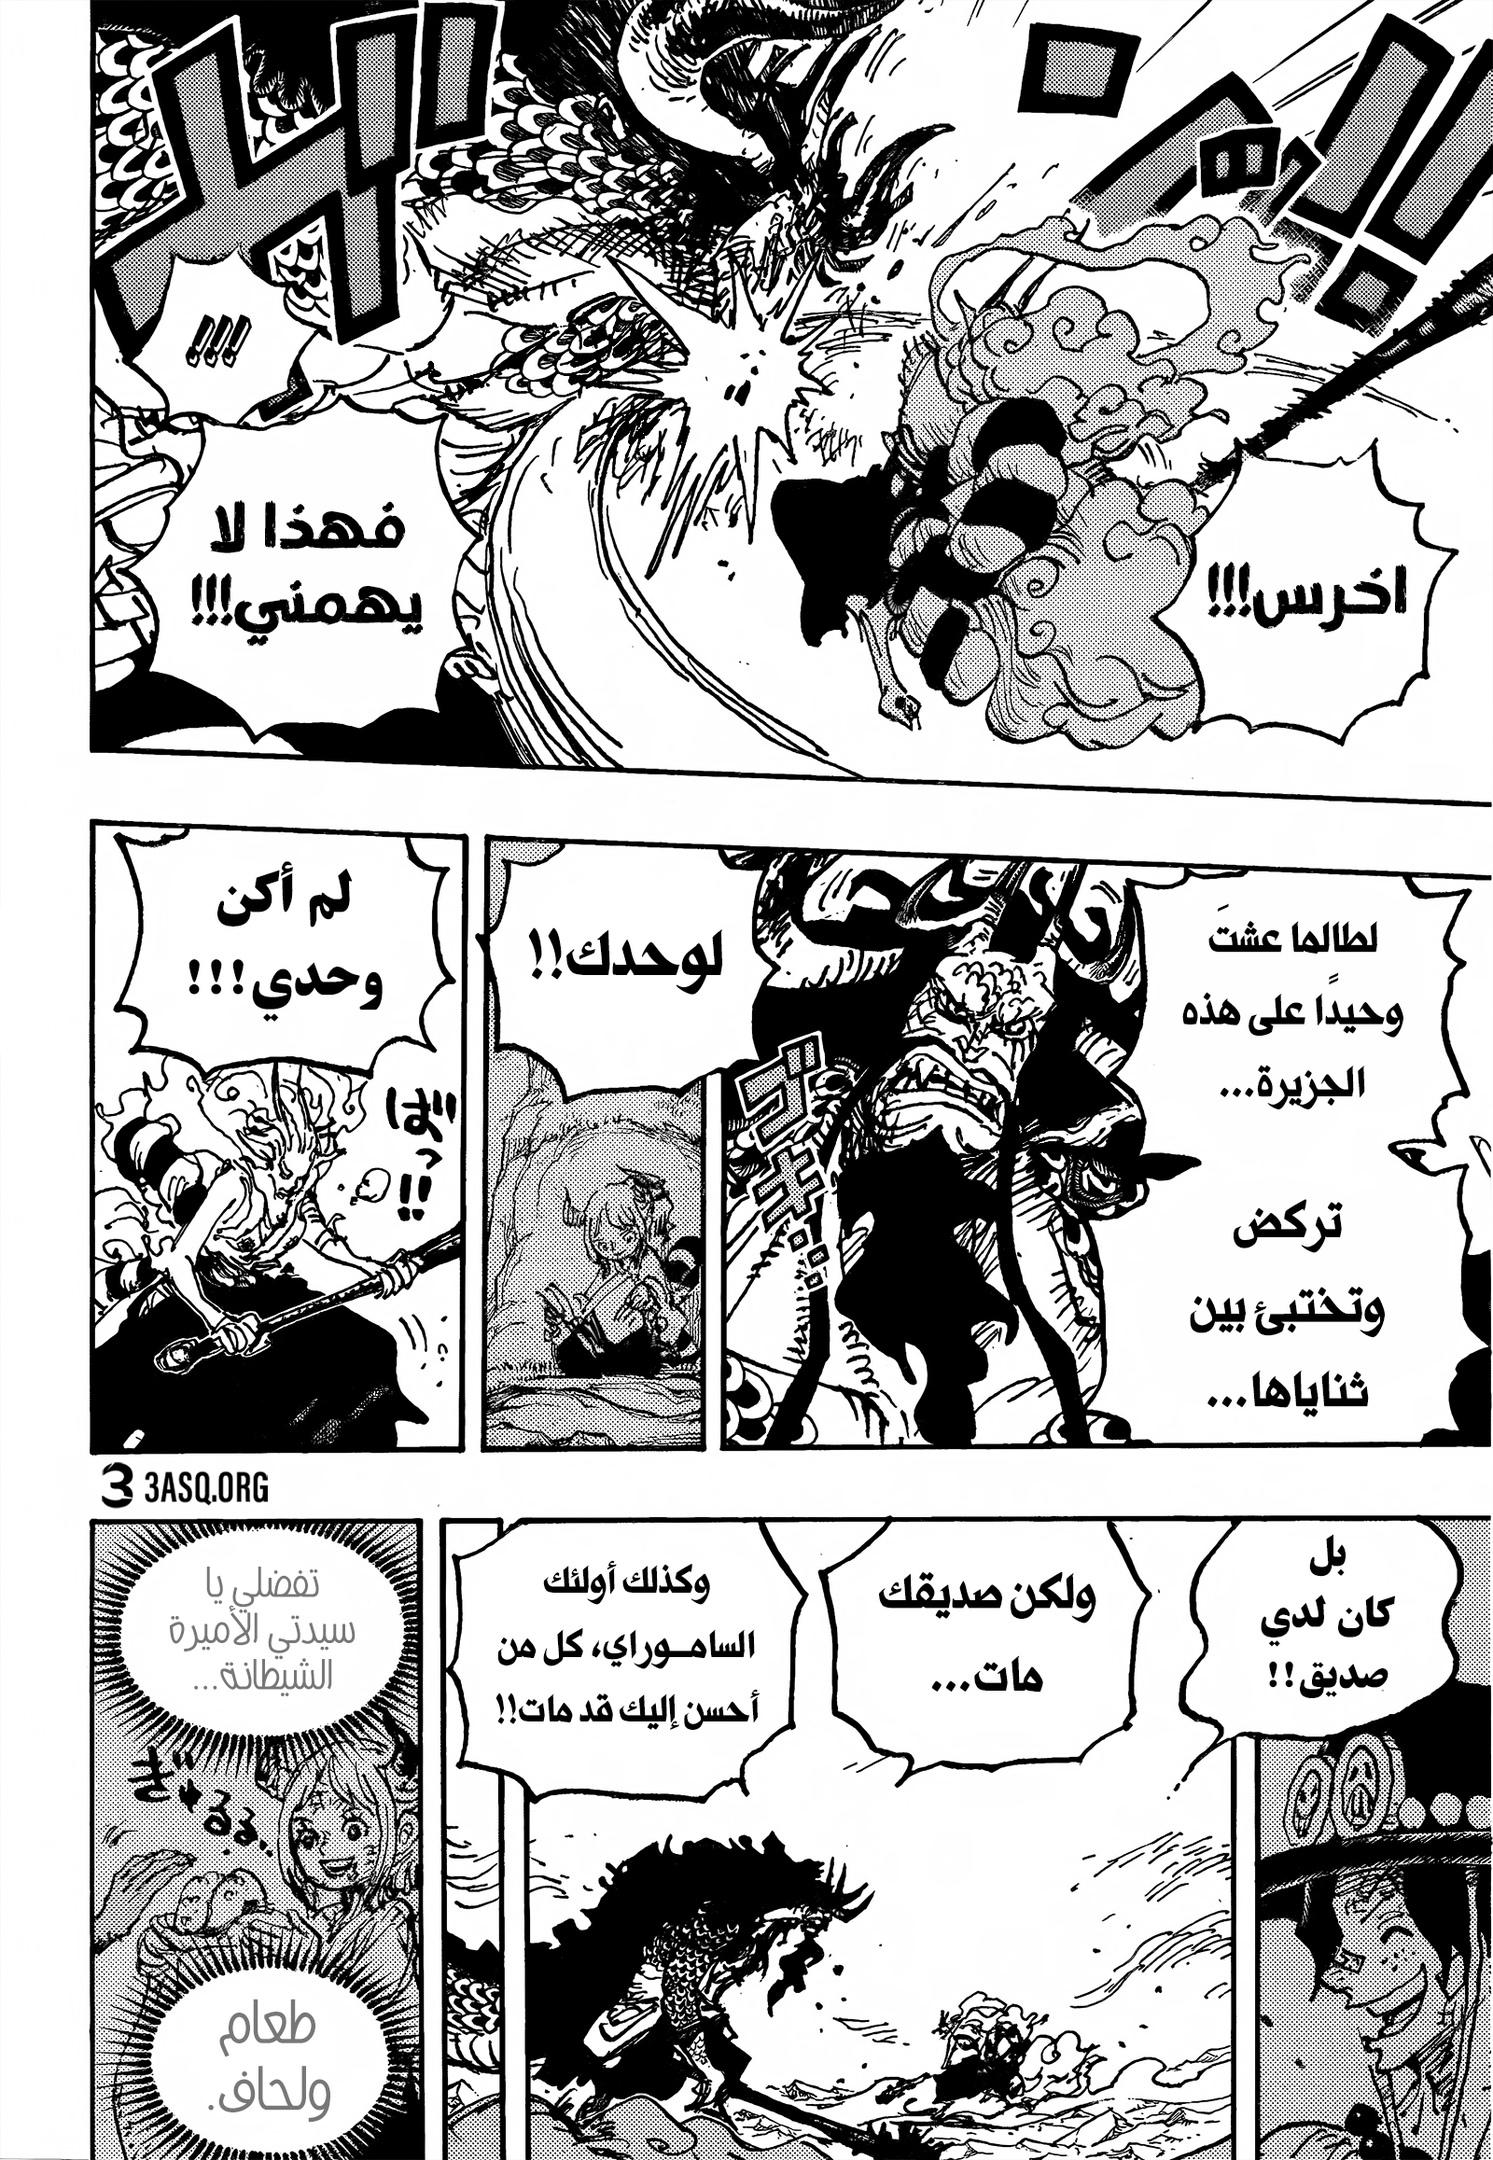 One Piece arab 1025, image №8